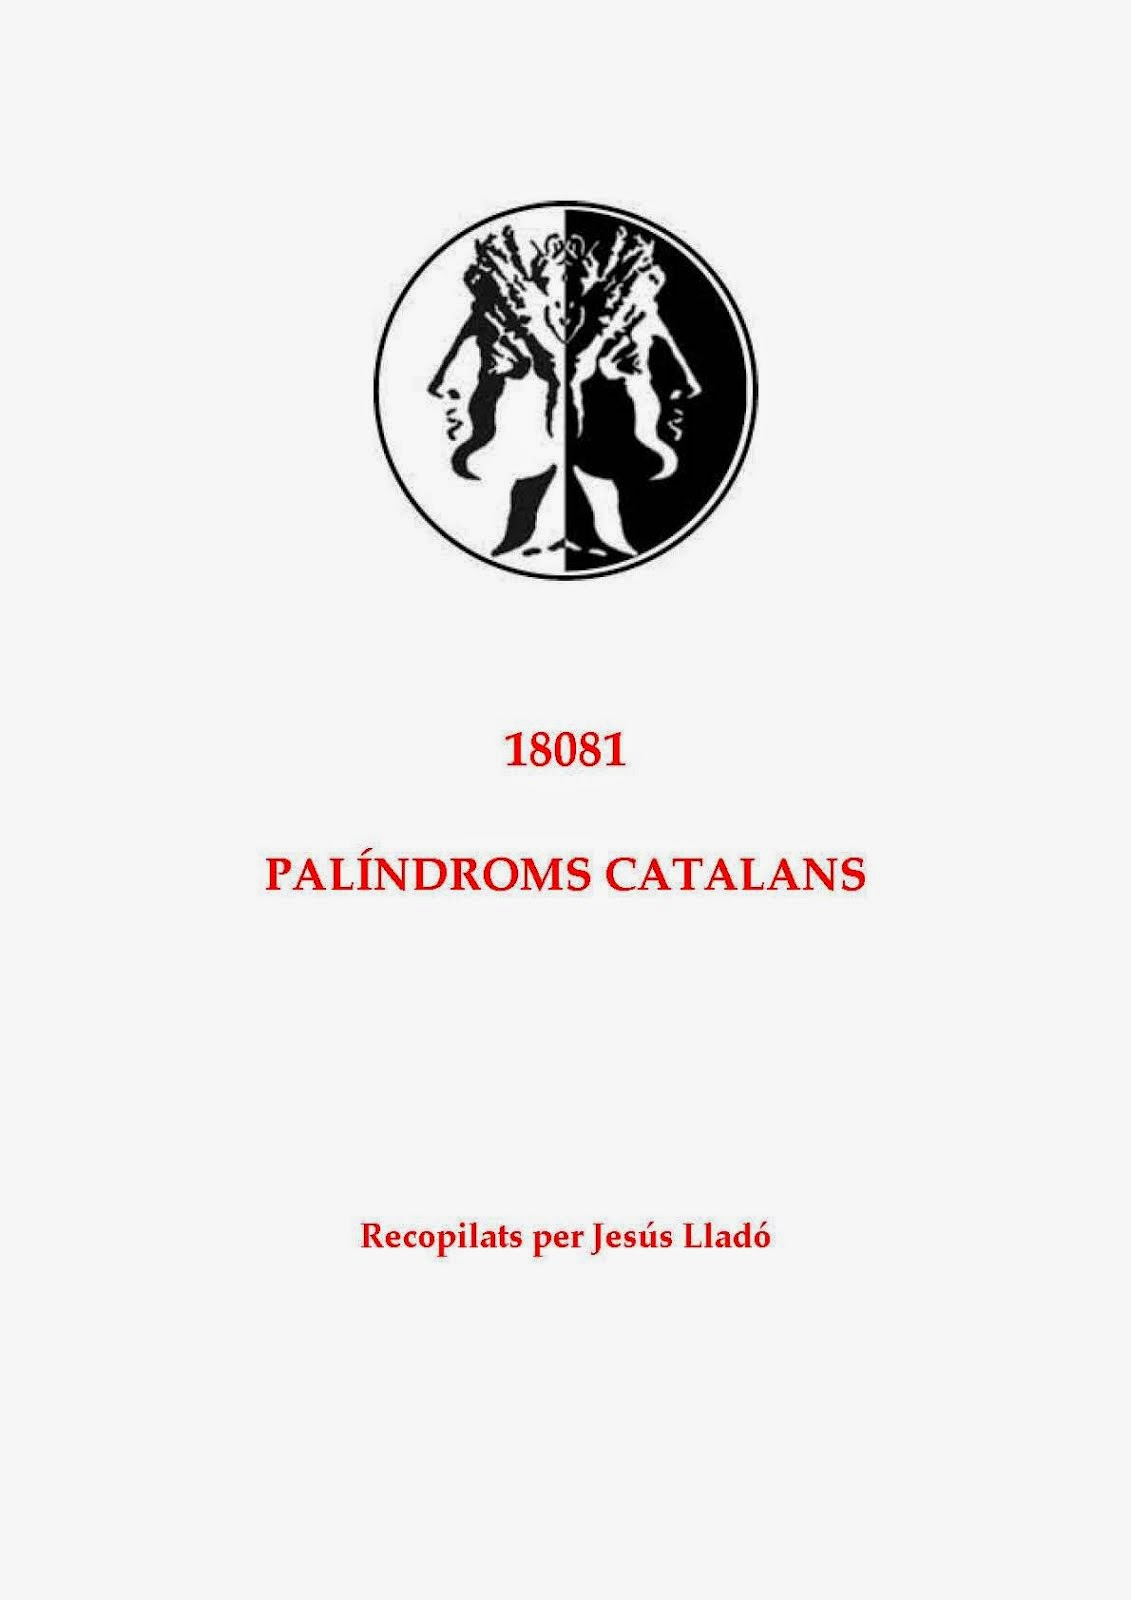 ARXIU GENERAL DE PALÍNDROMS CATALANS